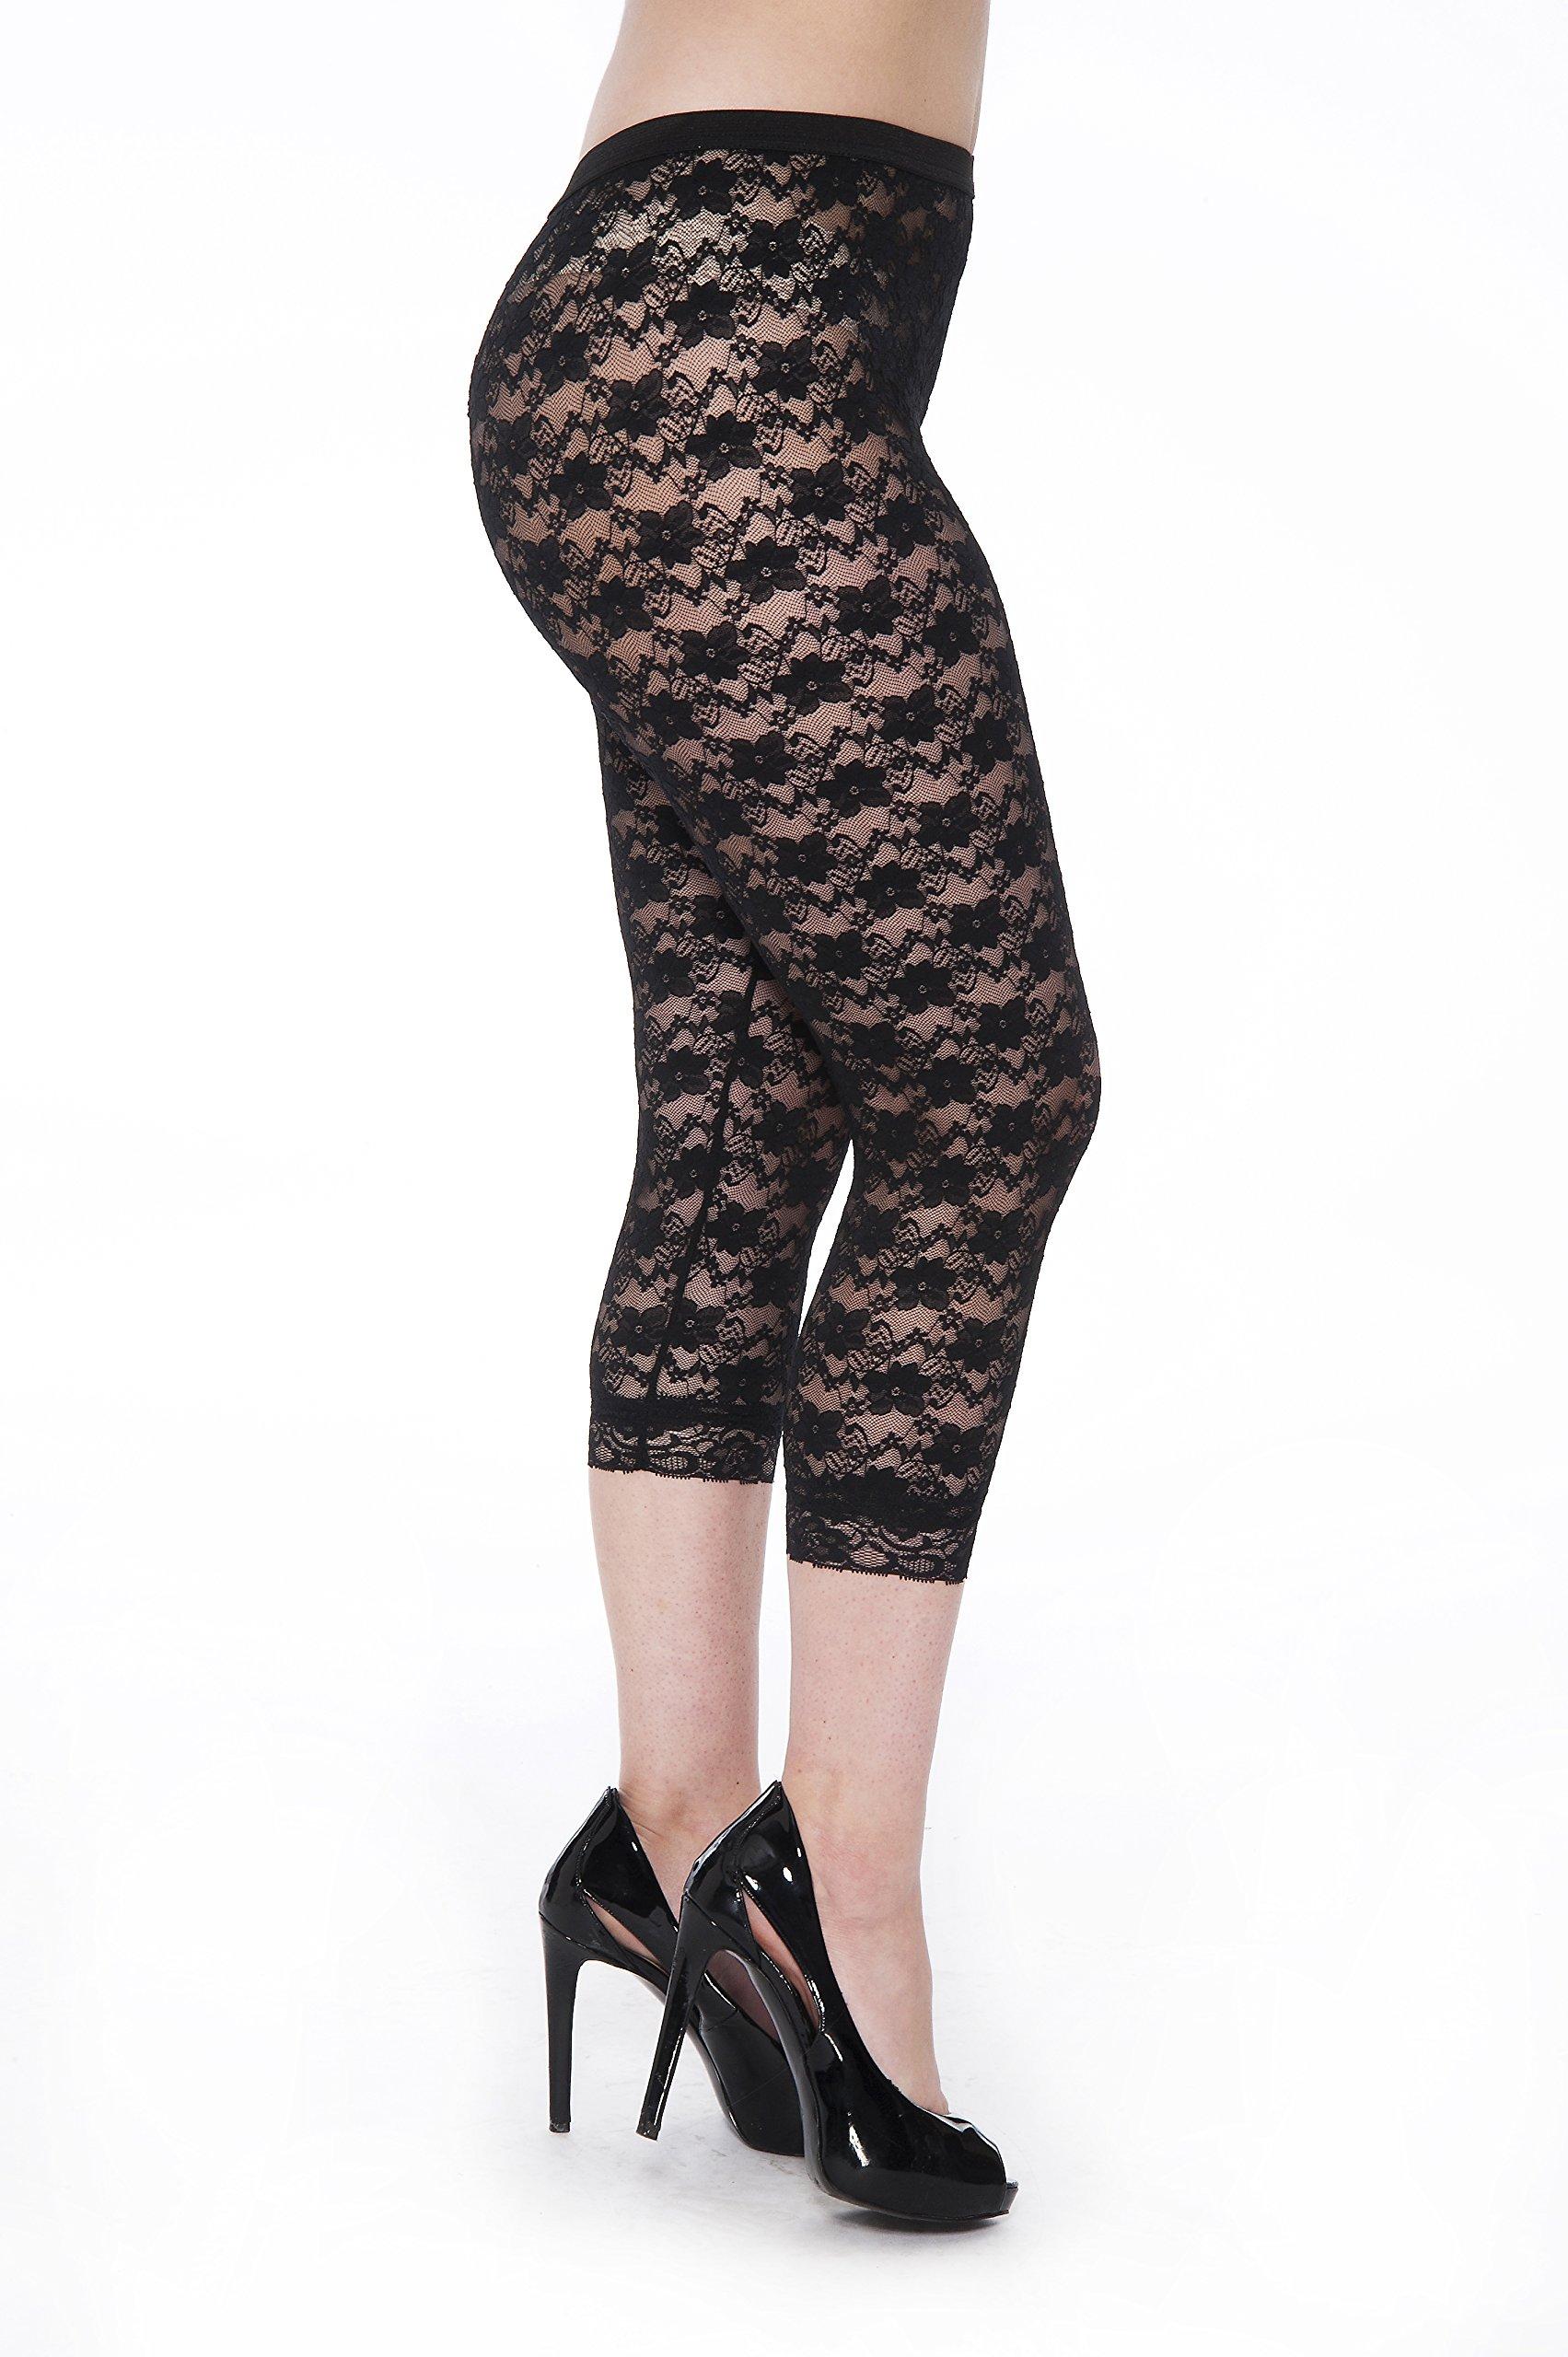 Unique Styles Lace Capri Leggings Tights Soft Stretchy Floral Pattern Pants Black White Pink (XX-Large, Black)